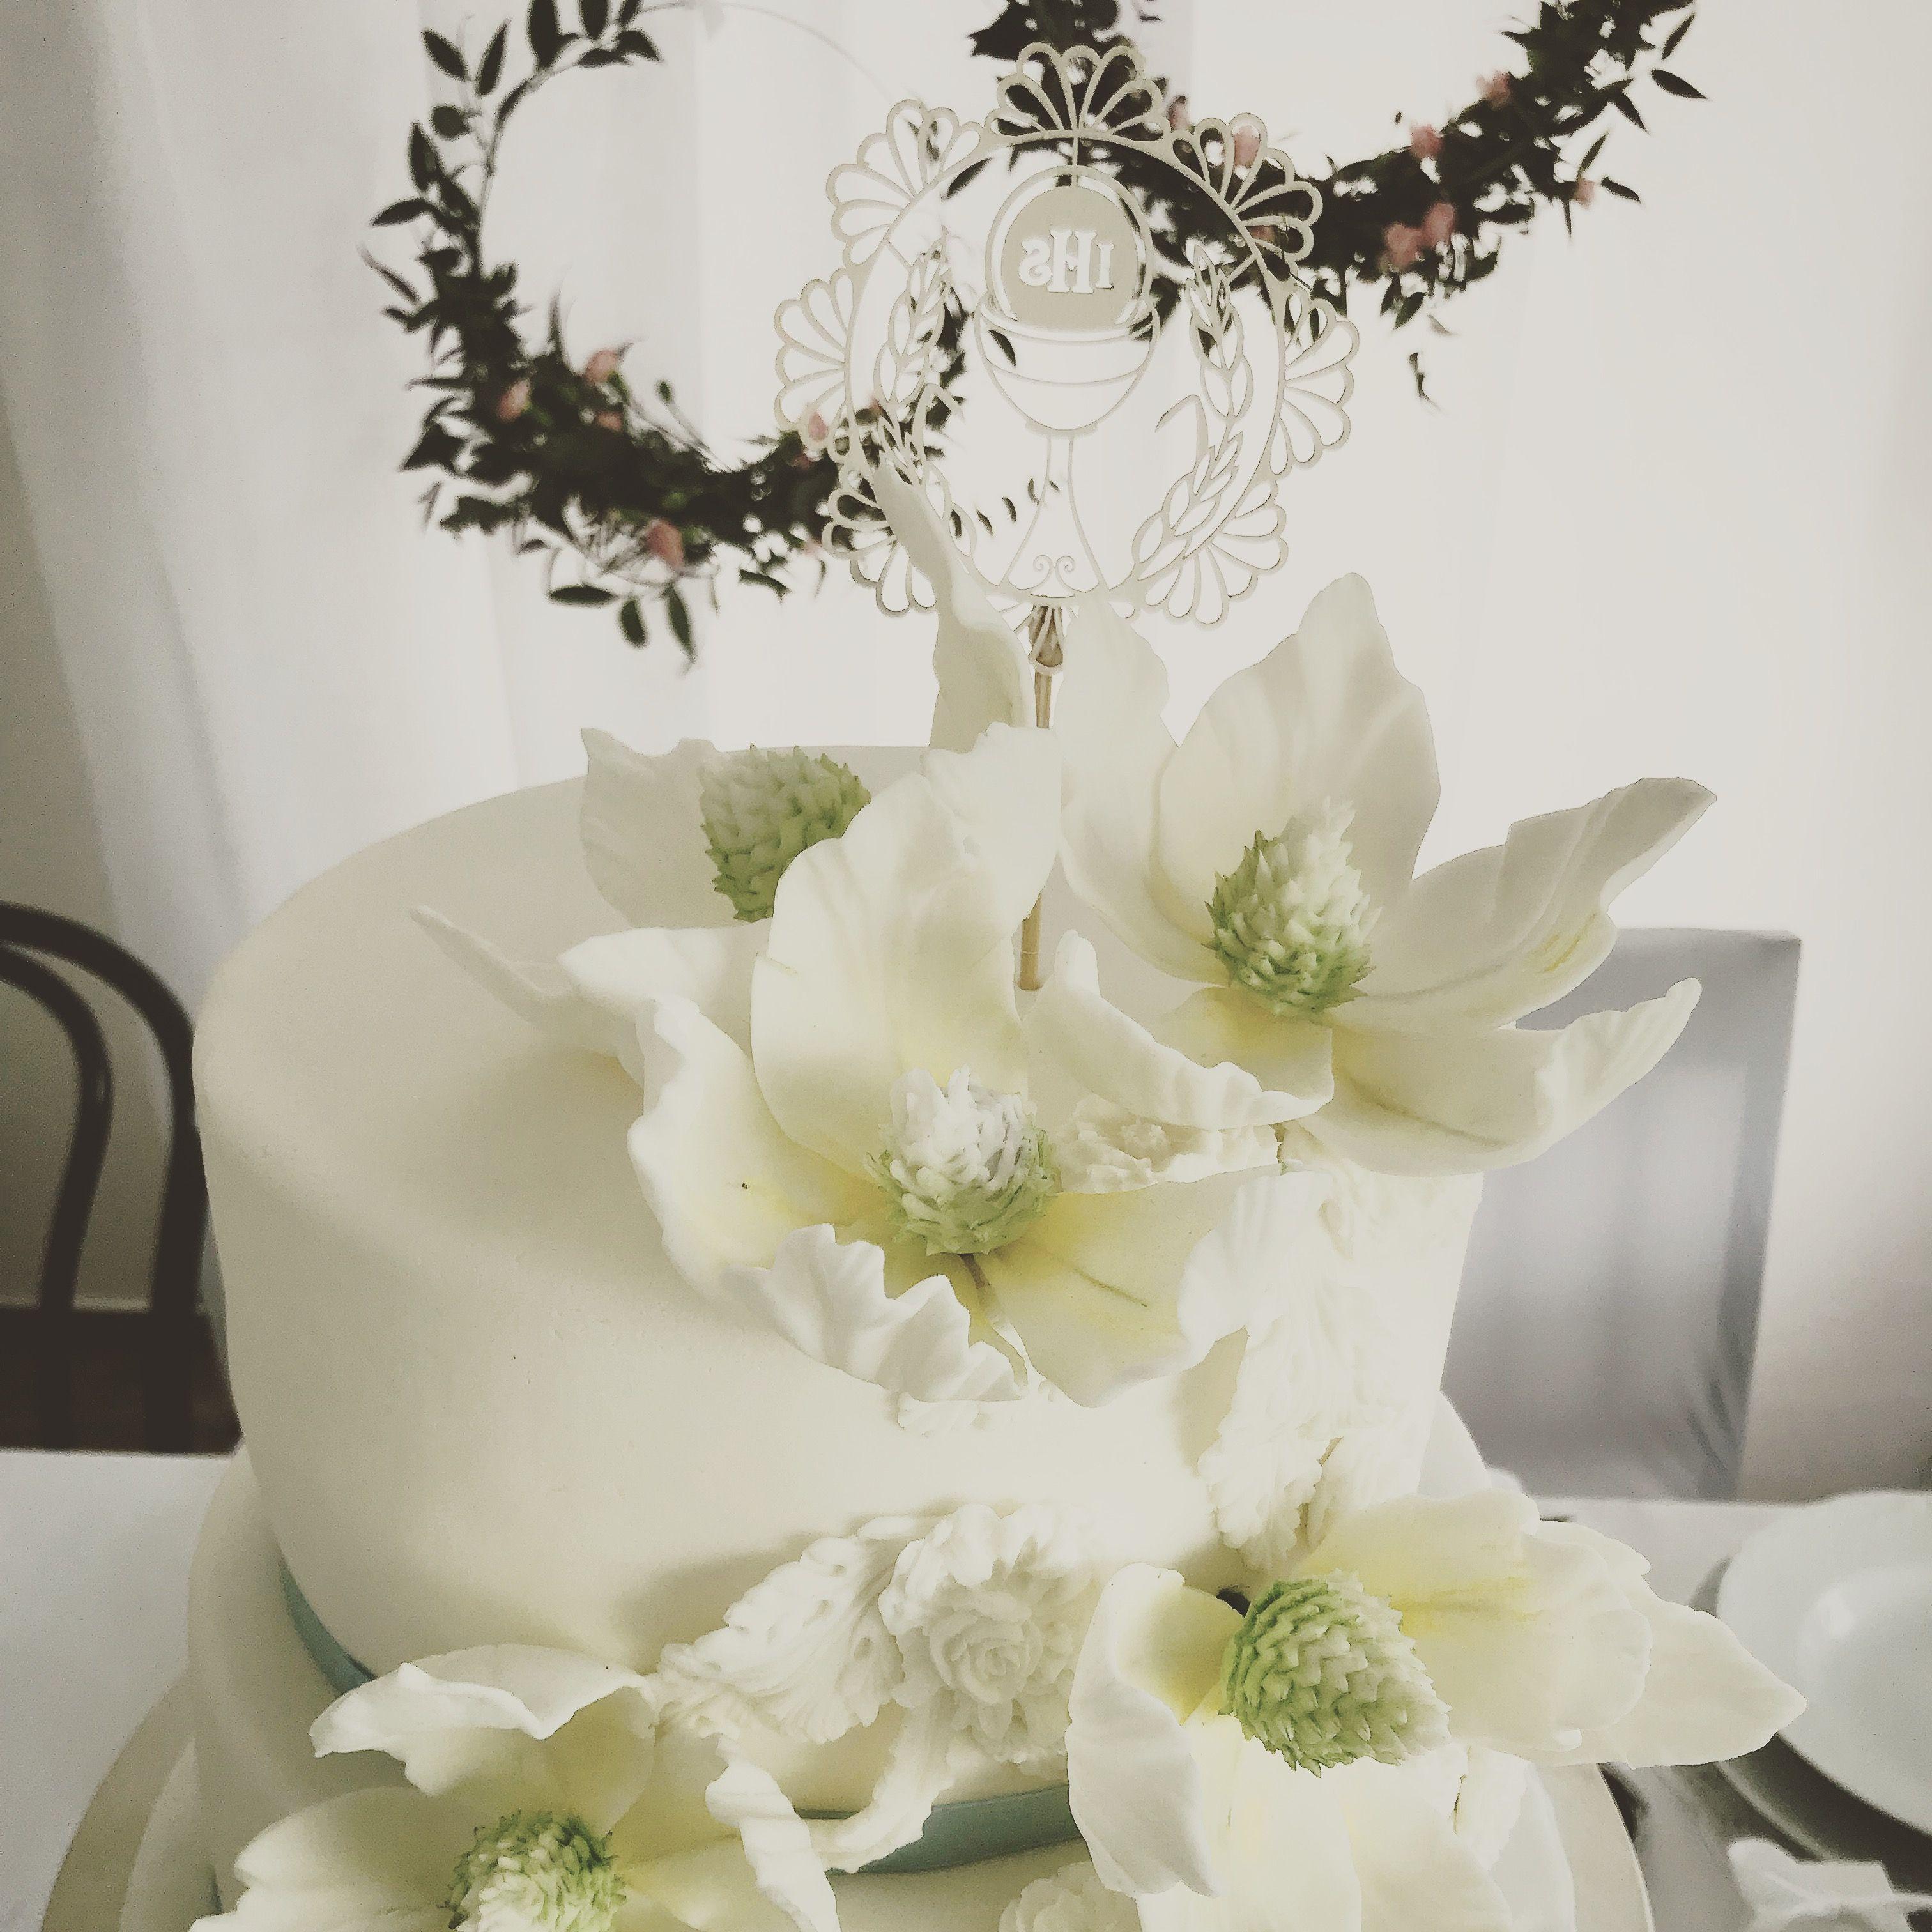 Pin By Anna Olkis On Anna Olkis Sugar Flowers Sugar Flowers Cake Desserts